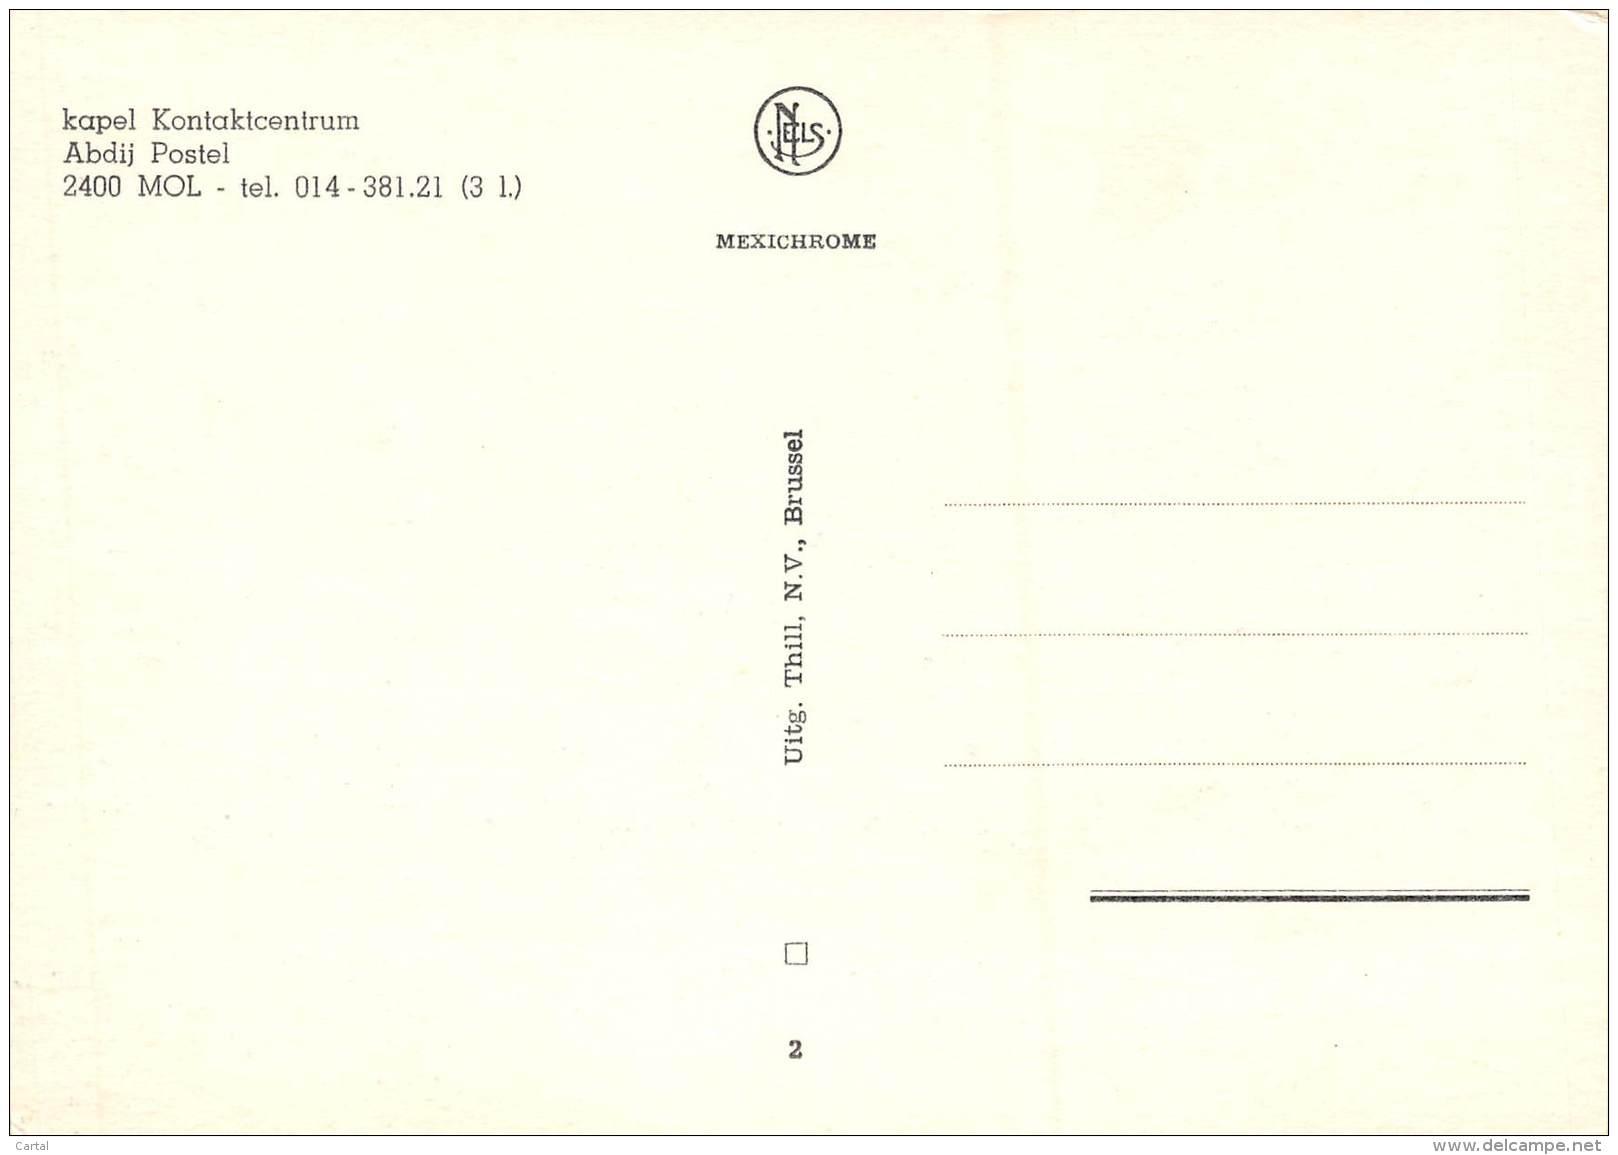 CPM - MOL - Abdij Postel - Kapel Kontaktcentrum - Mol